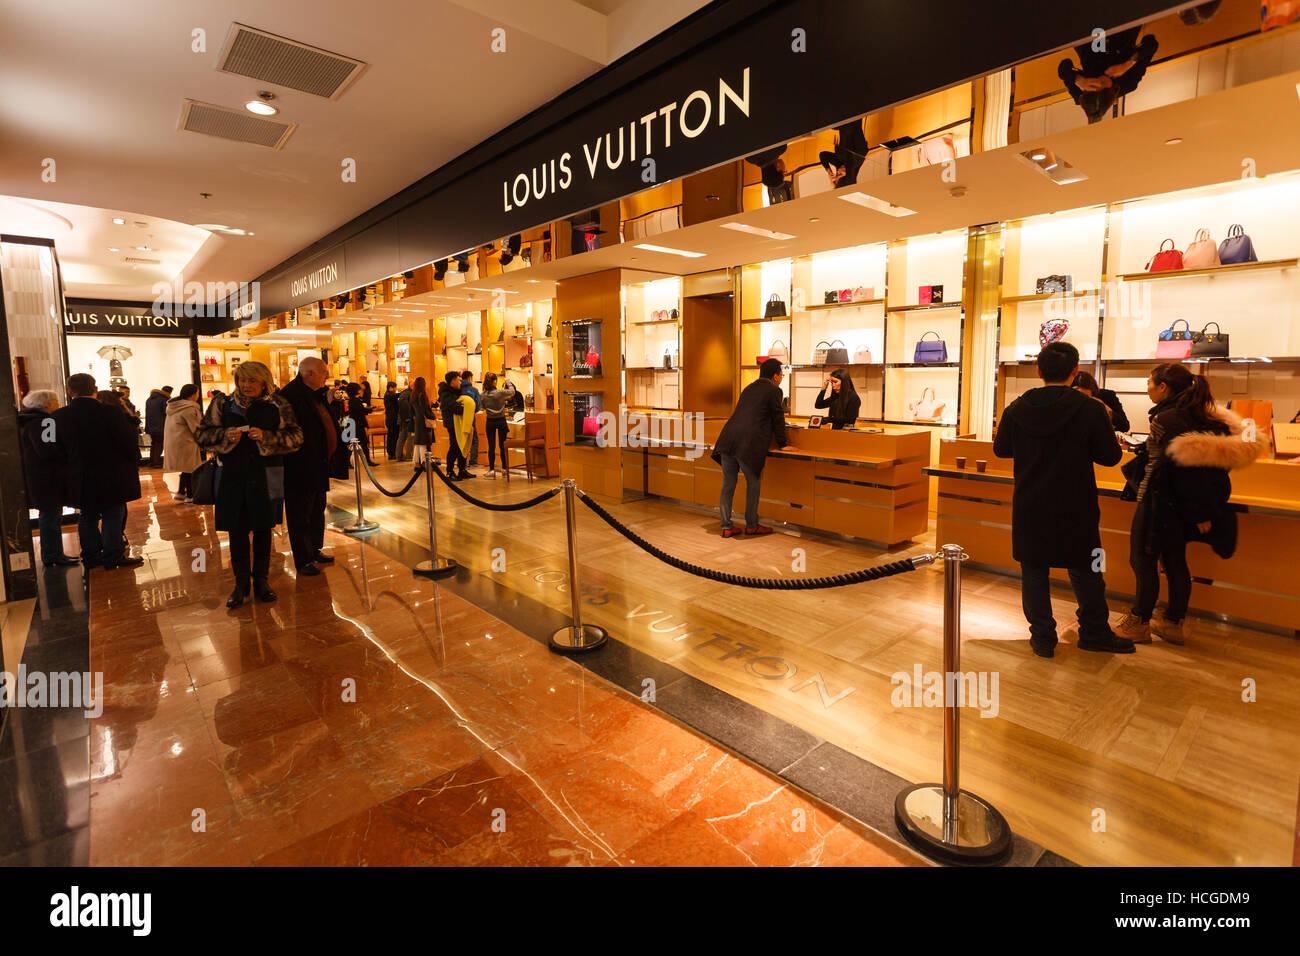 dcd79b8b4e5 Louis Vuitton in Galeries Lafayette